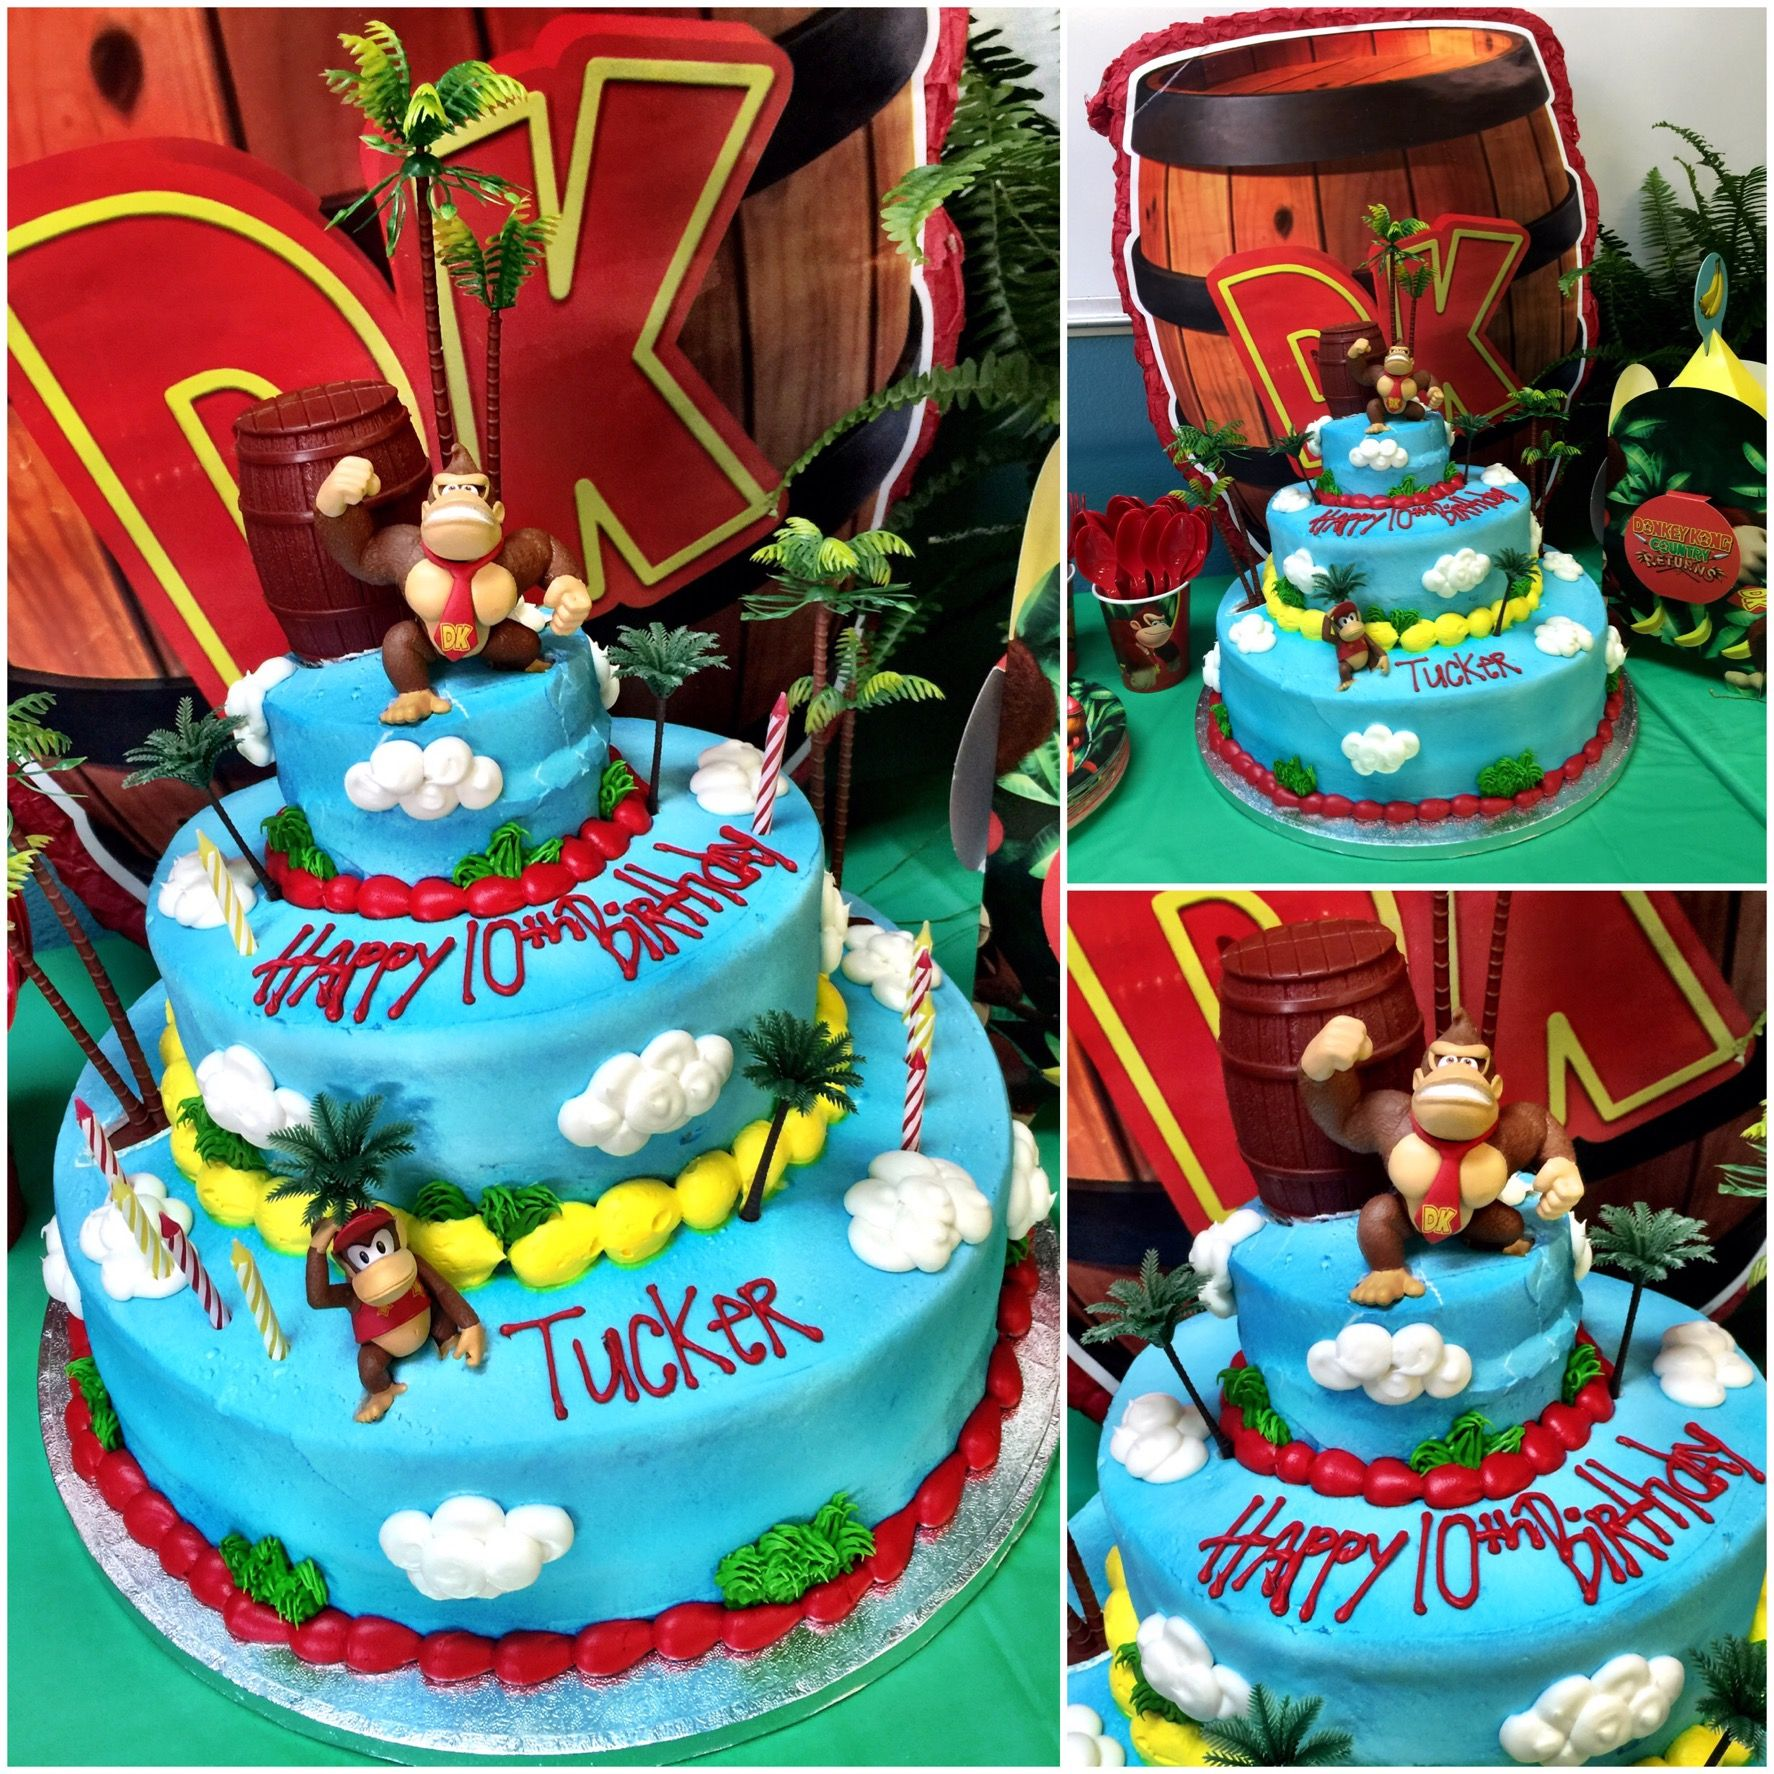 Marvelous Donkey Kong Birthday Cake With Images Donkey Kong Party Funny Birthday Cards Online Amentibdeldamsfinfo